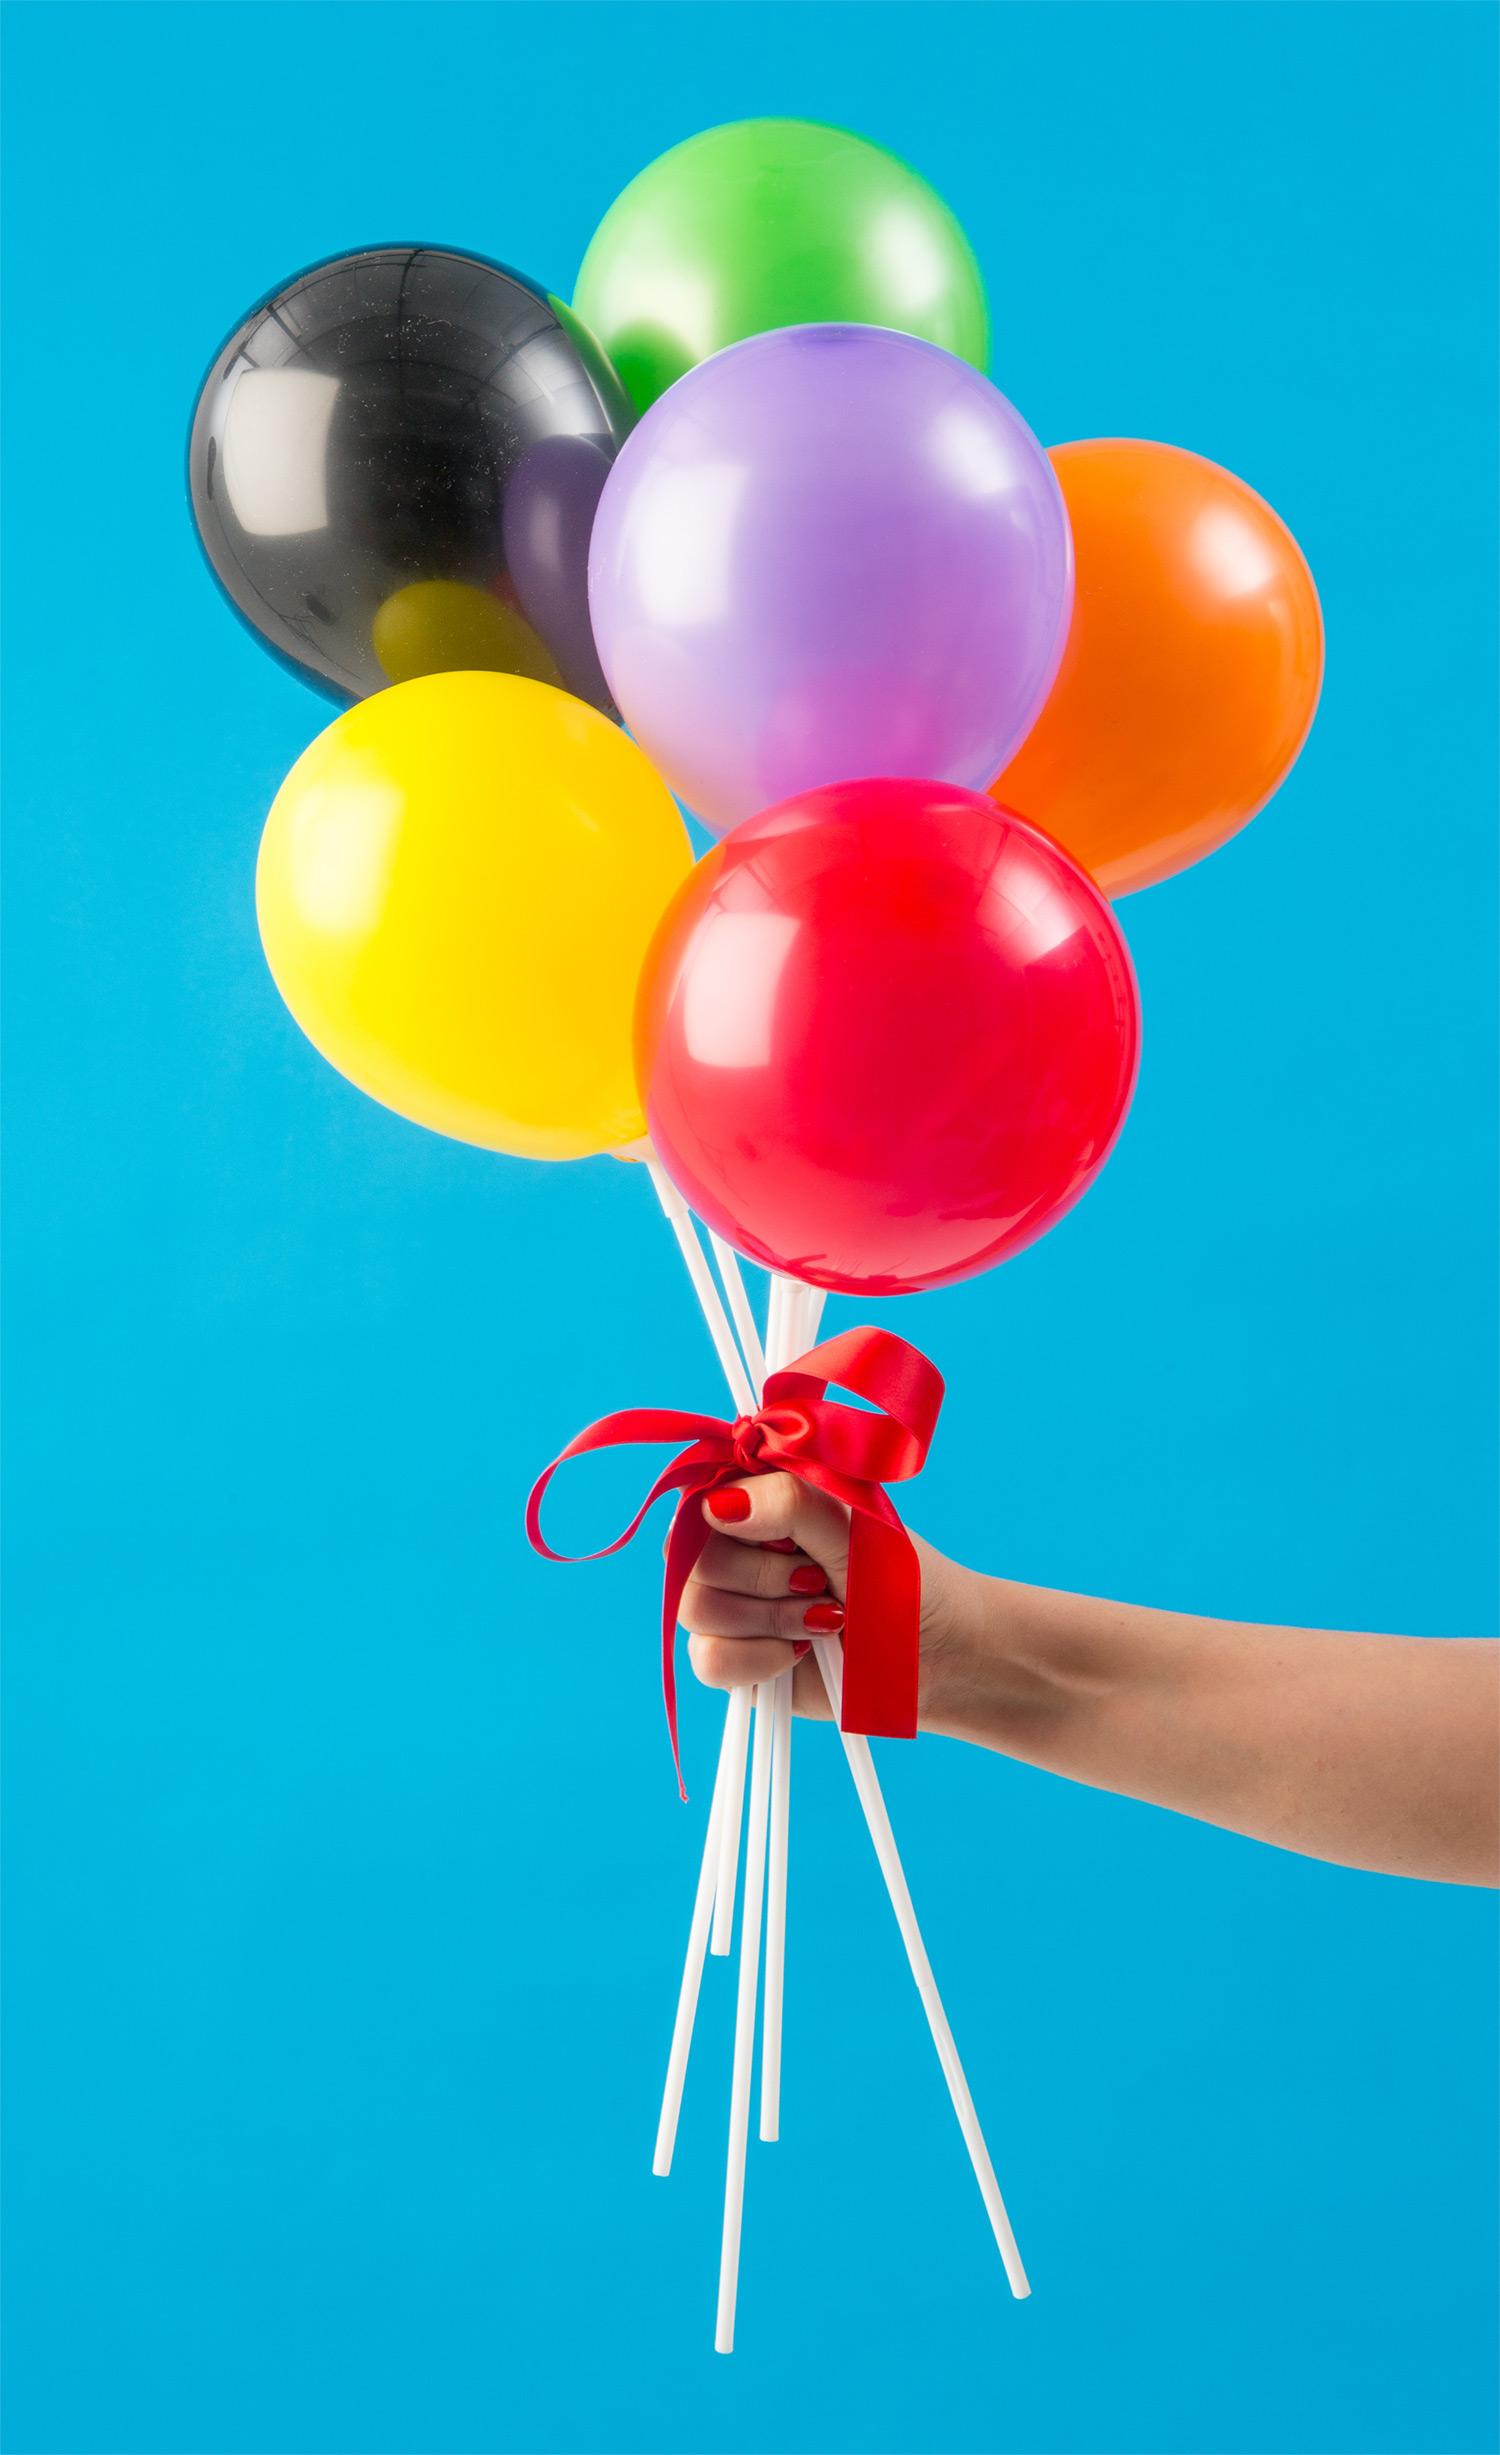 Bukett av miniballonger